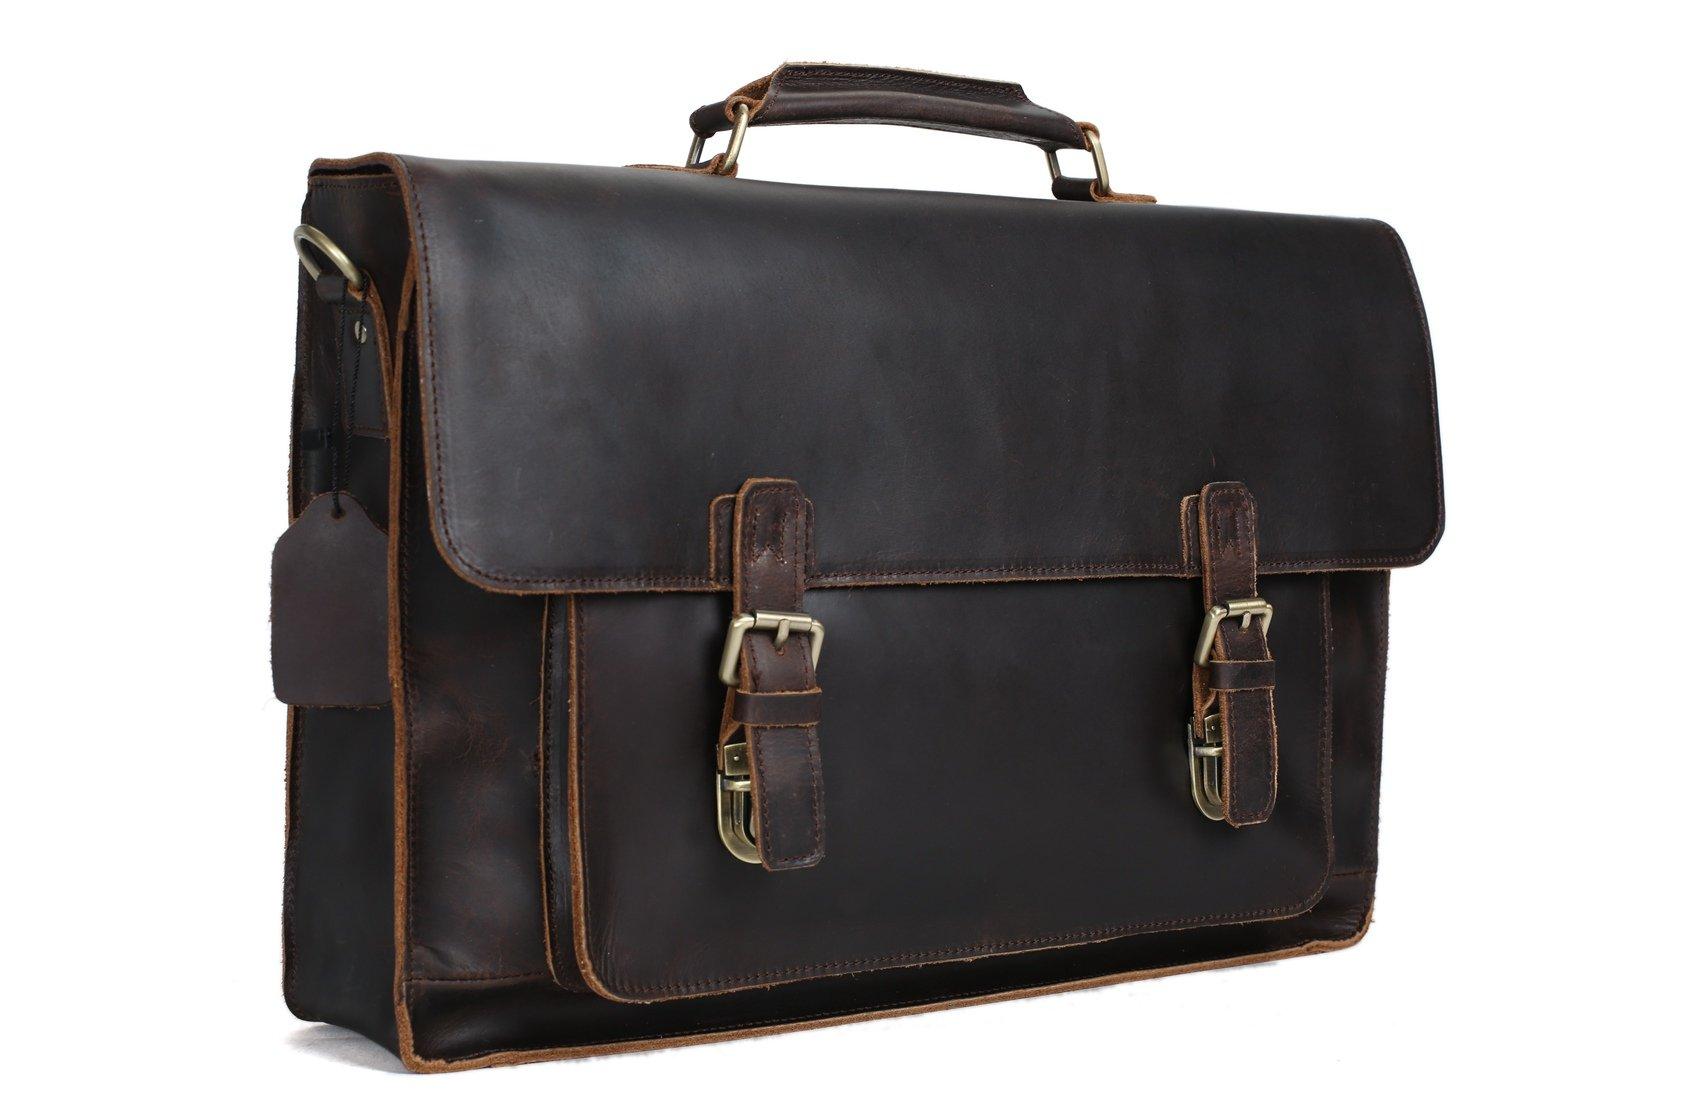 17 Handmade Leather Laptop Bag Man Briefcase Messenger Handbag 7205l